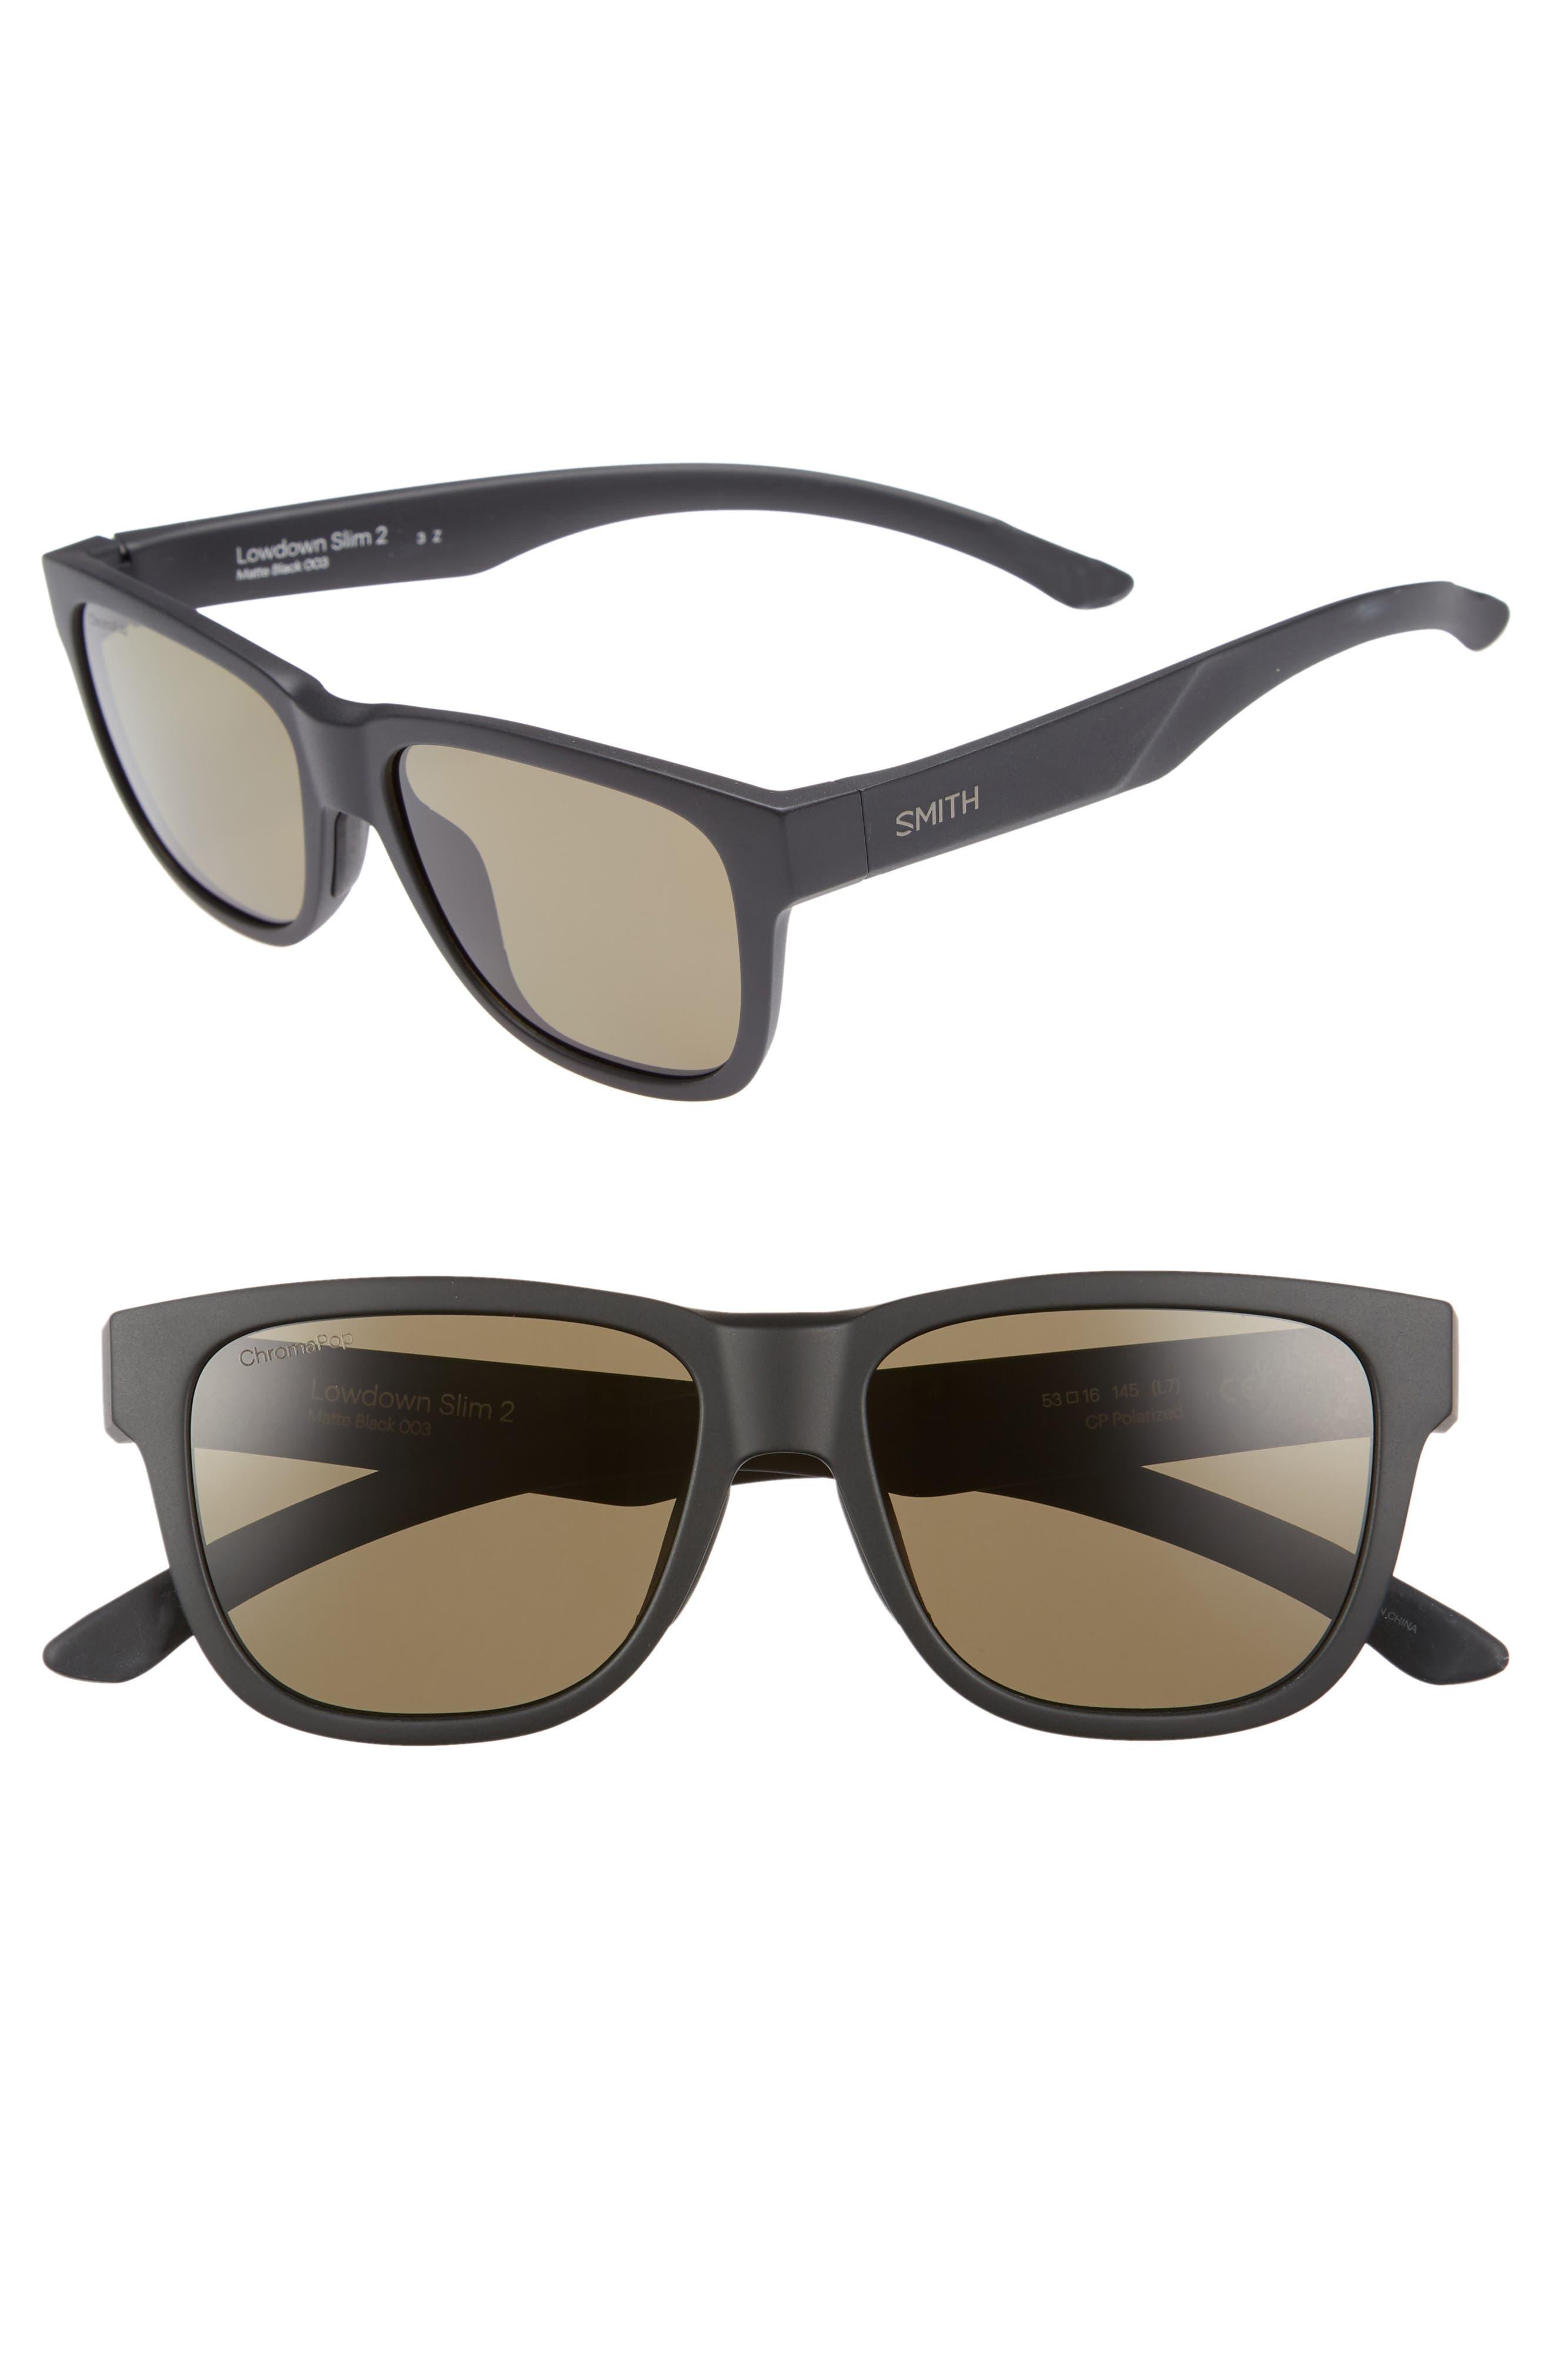 Lowdown Slim 2 53mm ChromaPop<sup>™</sup> Square Sunglasses,                         Main,                         color, MATTE BLACK